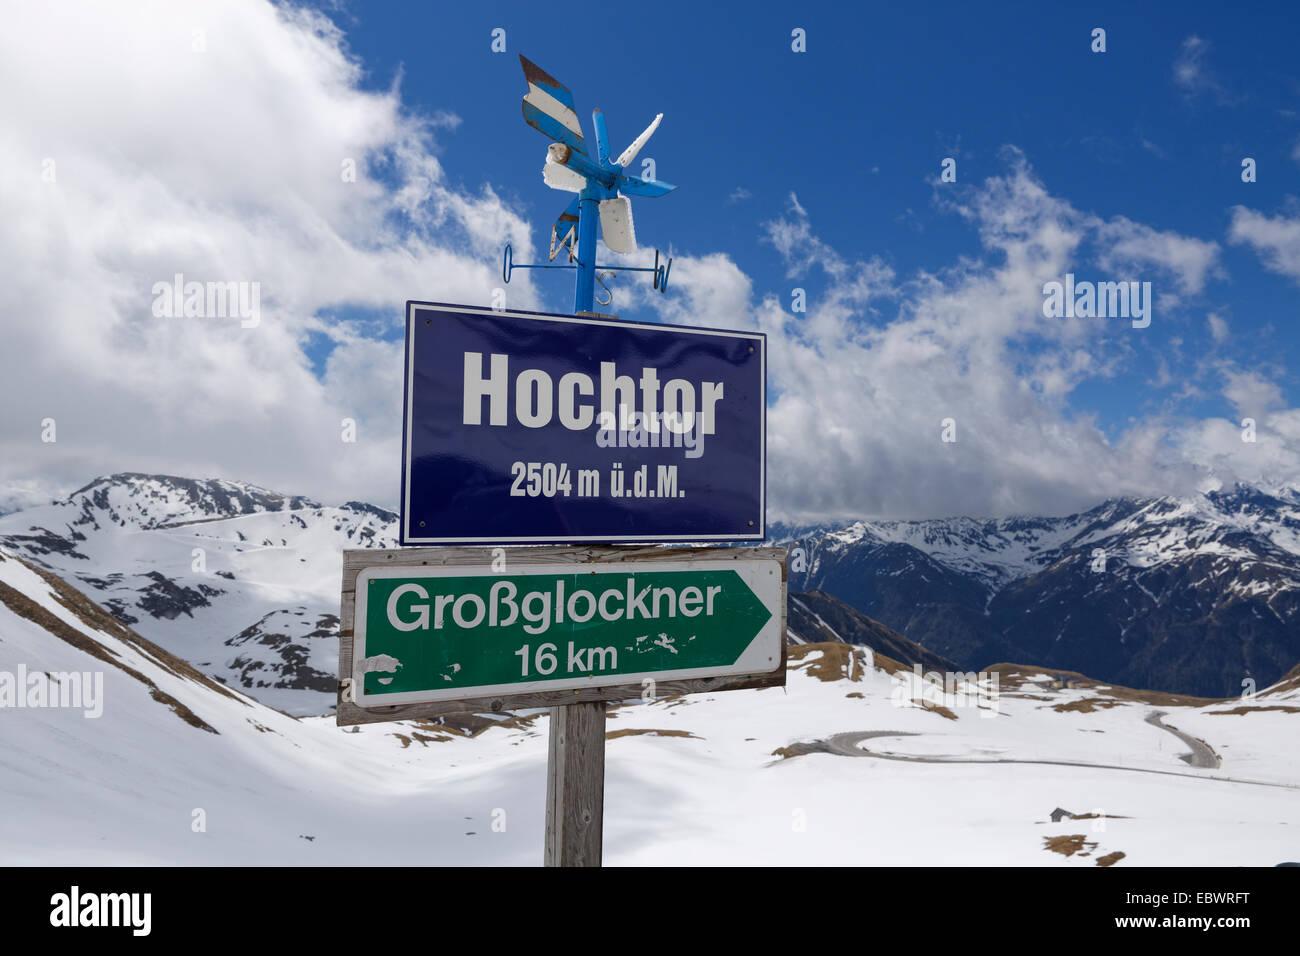 Sign with the elevation of Hochtor Pass on the Grossglockner High Alpine Road, Heiligenblut am Großglockner - Stock Image